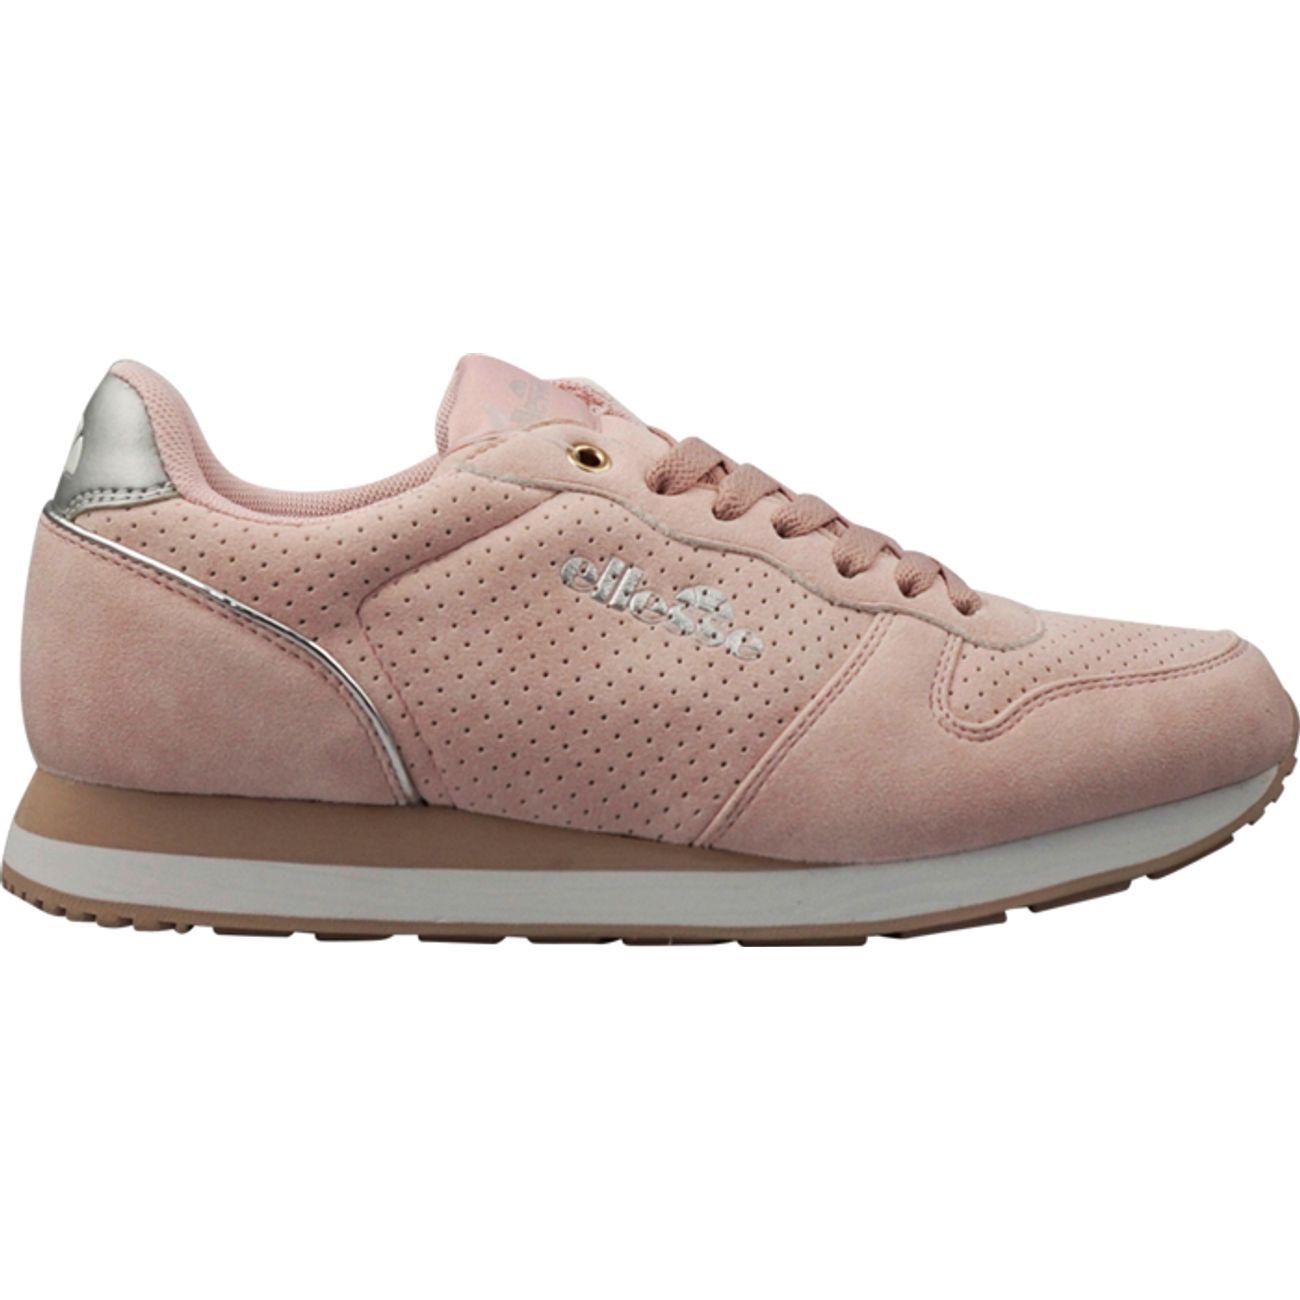 Chaussures Femme Loisirs achat pas cher GO Sport